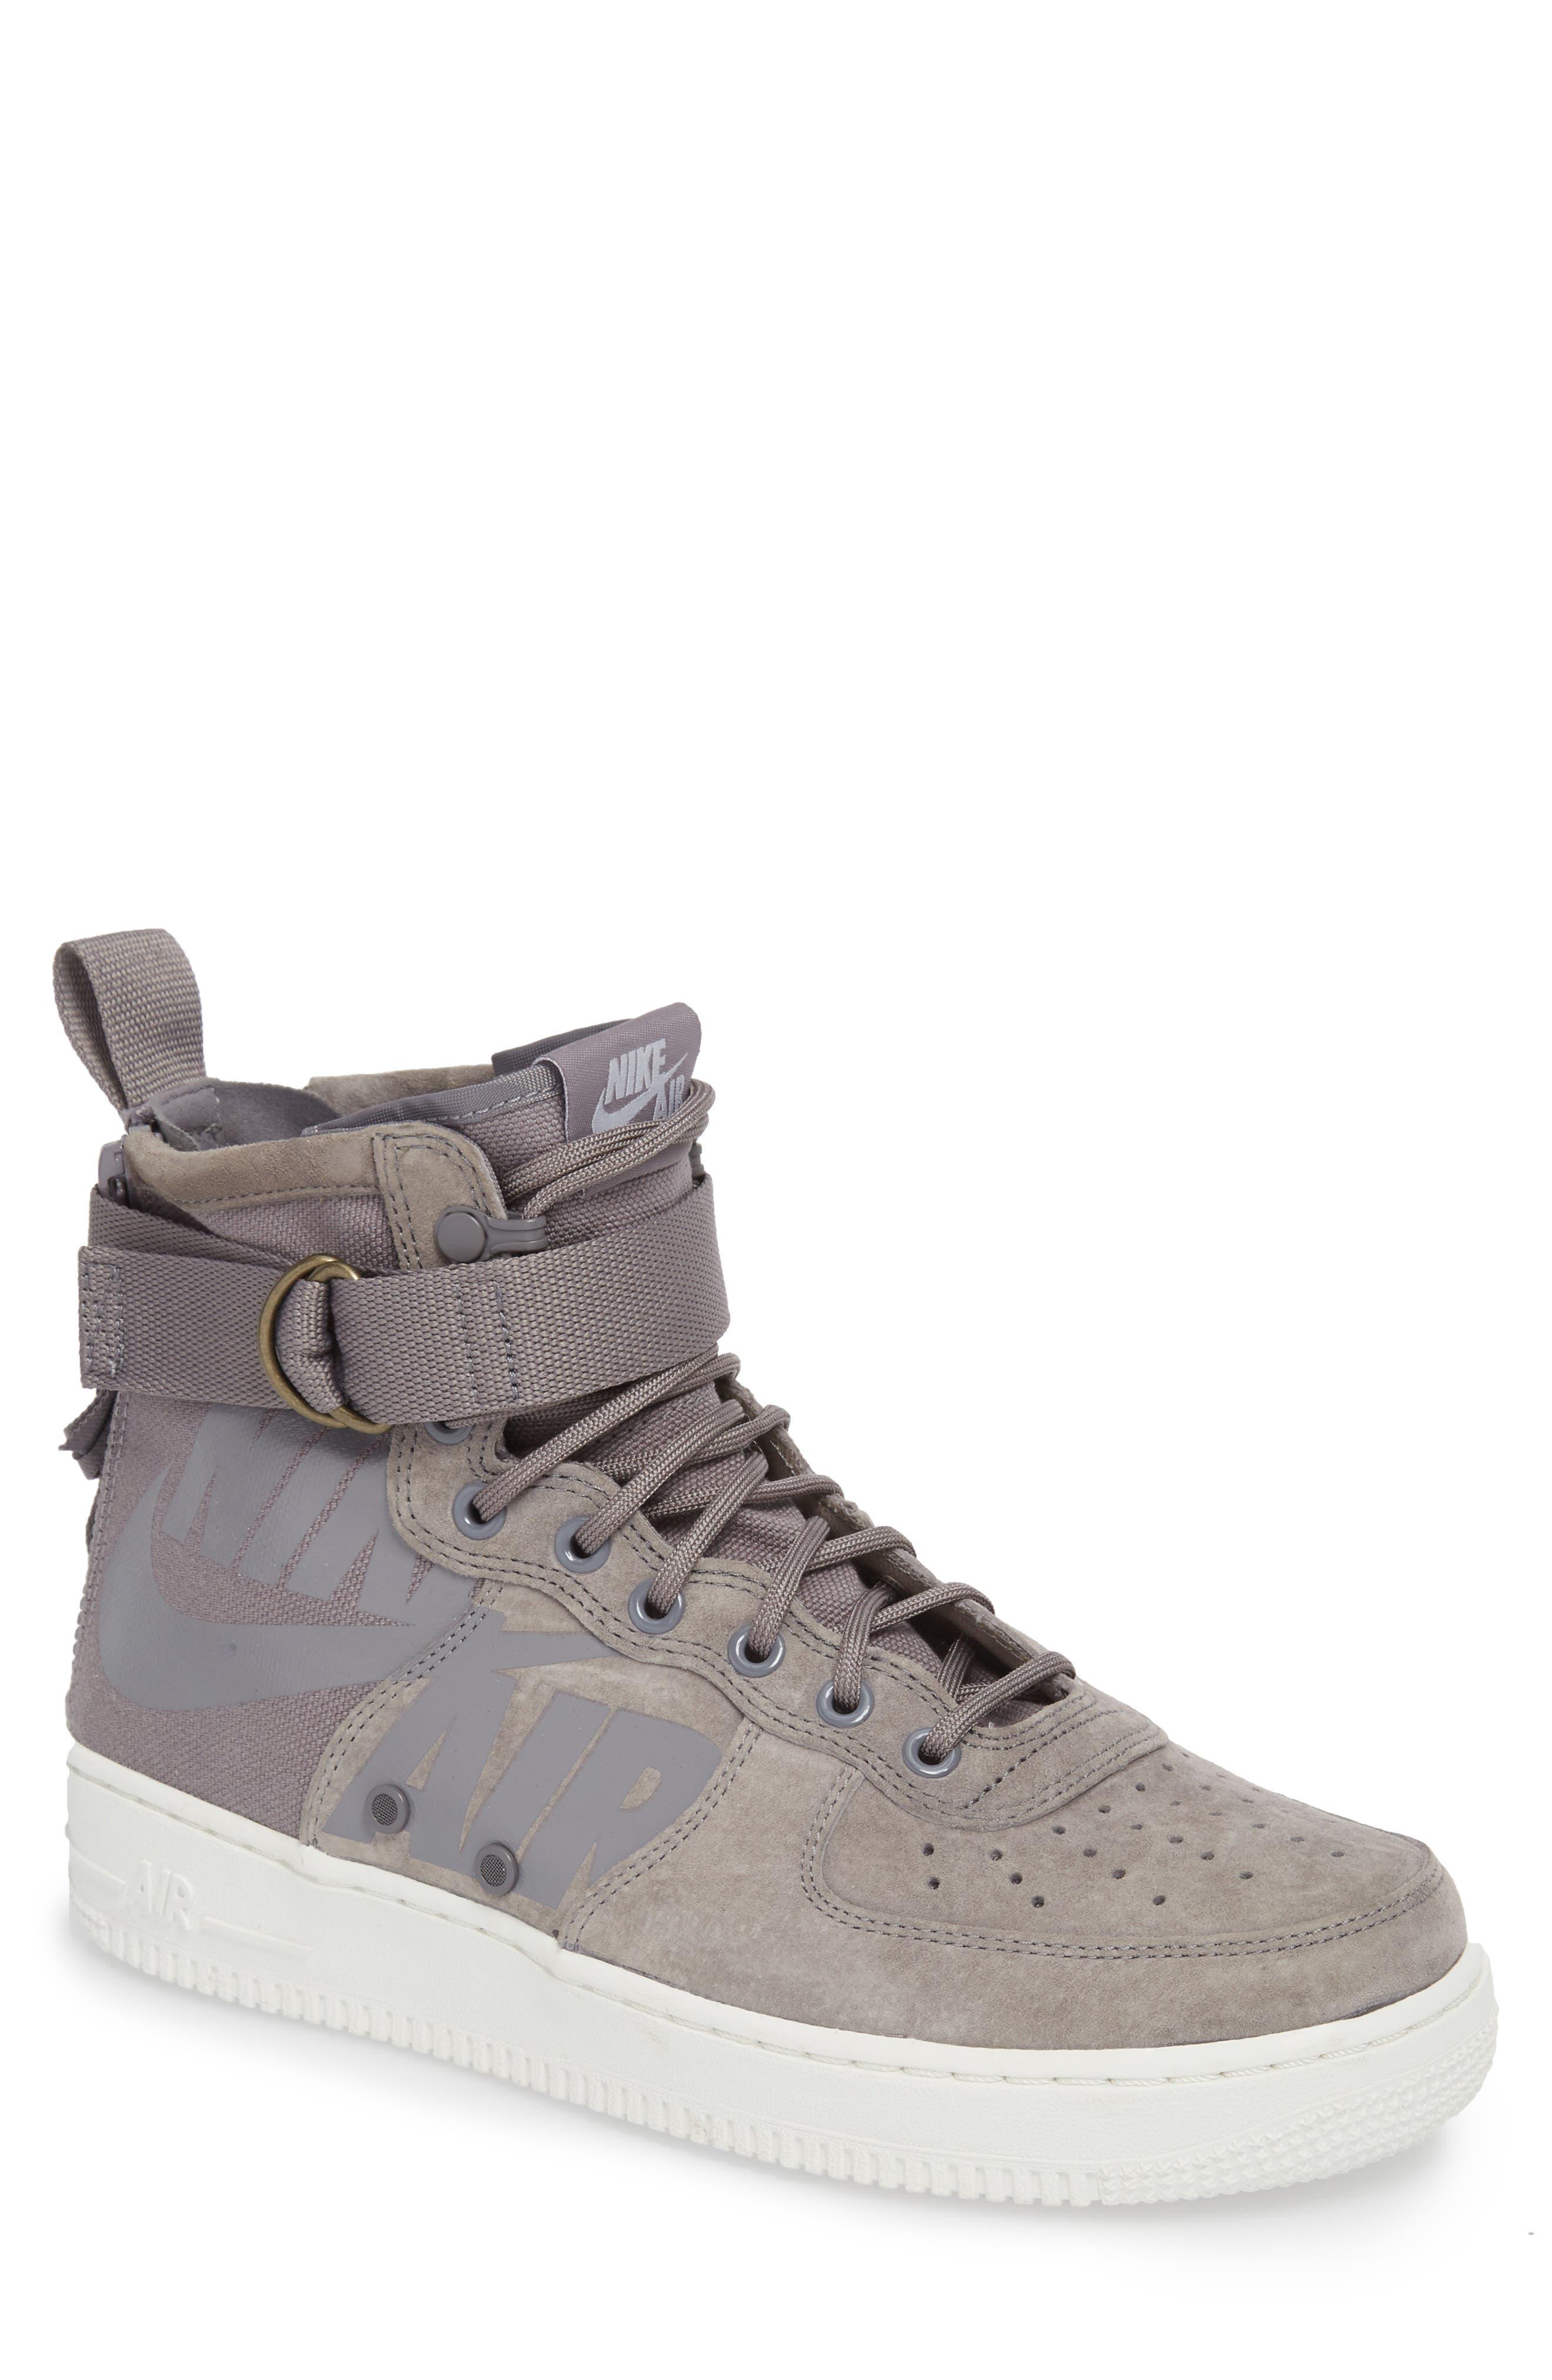 SF Air Force 1 Mid Sneaker,                         Main,                         color, GUNSMOKE/ WOLF GREY/ WHITE